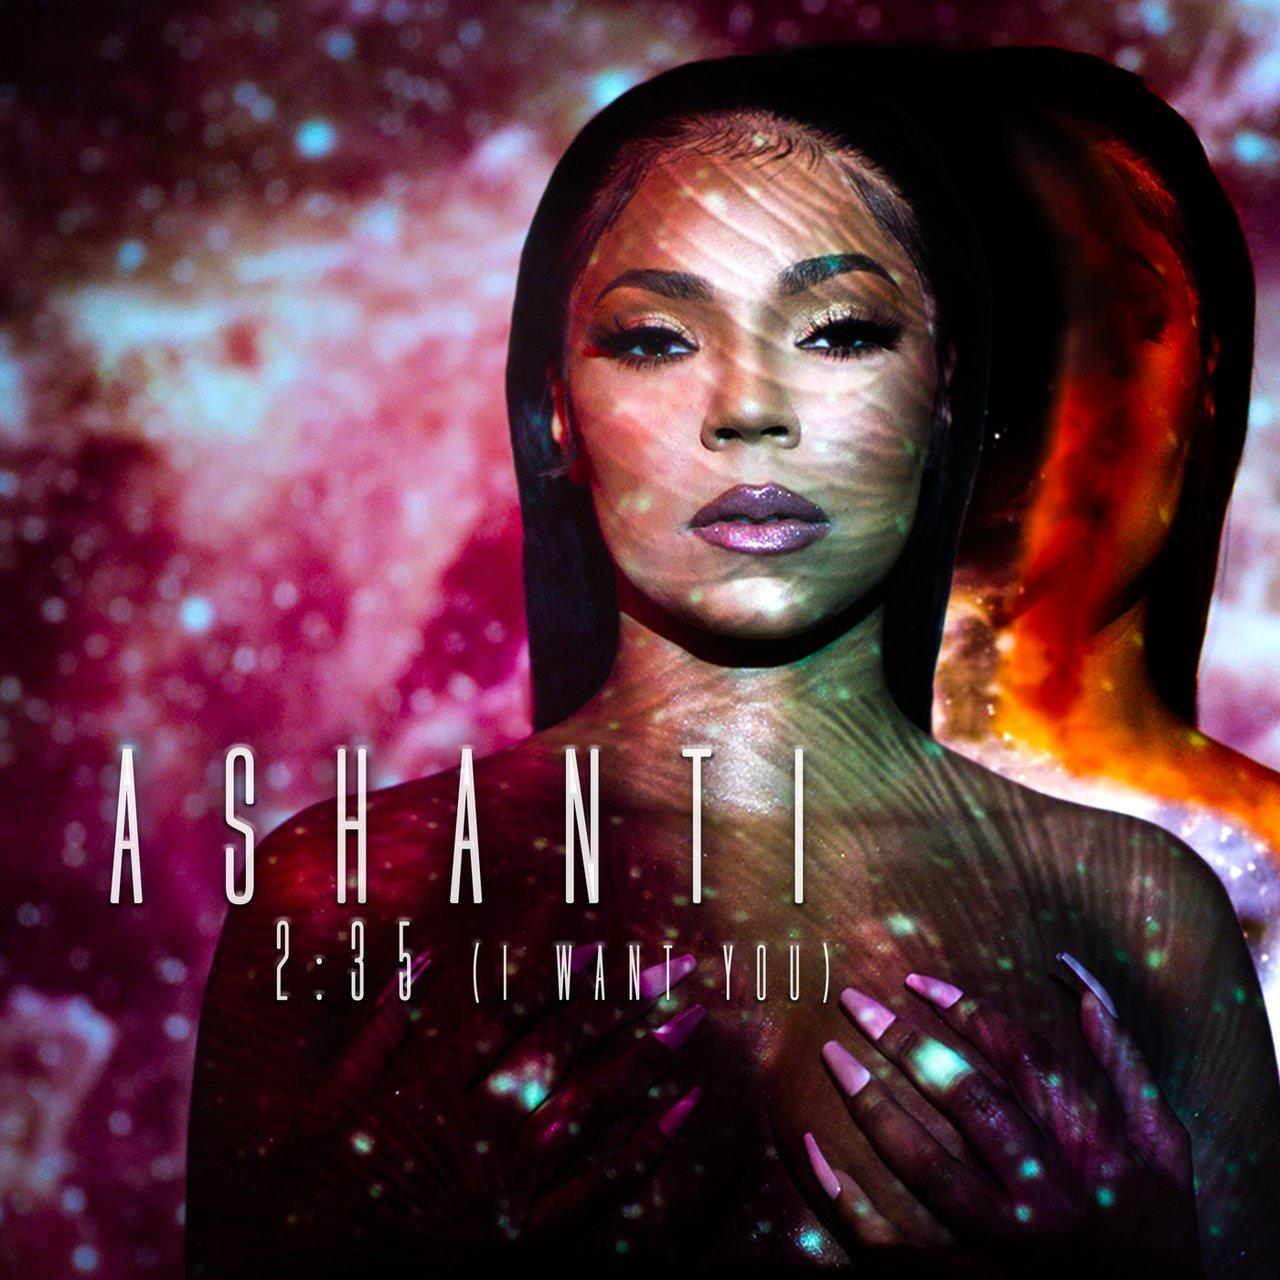 Ashanti – 235 (2:35 I Want You) Mp3